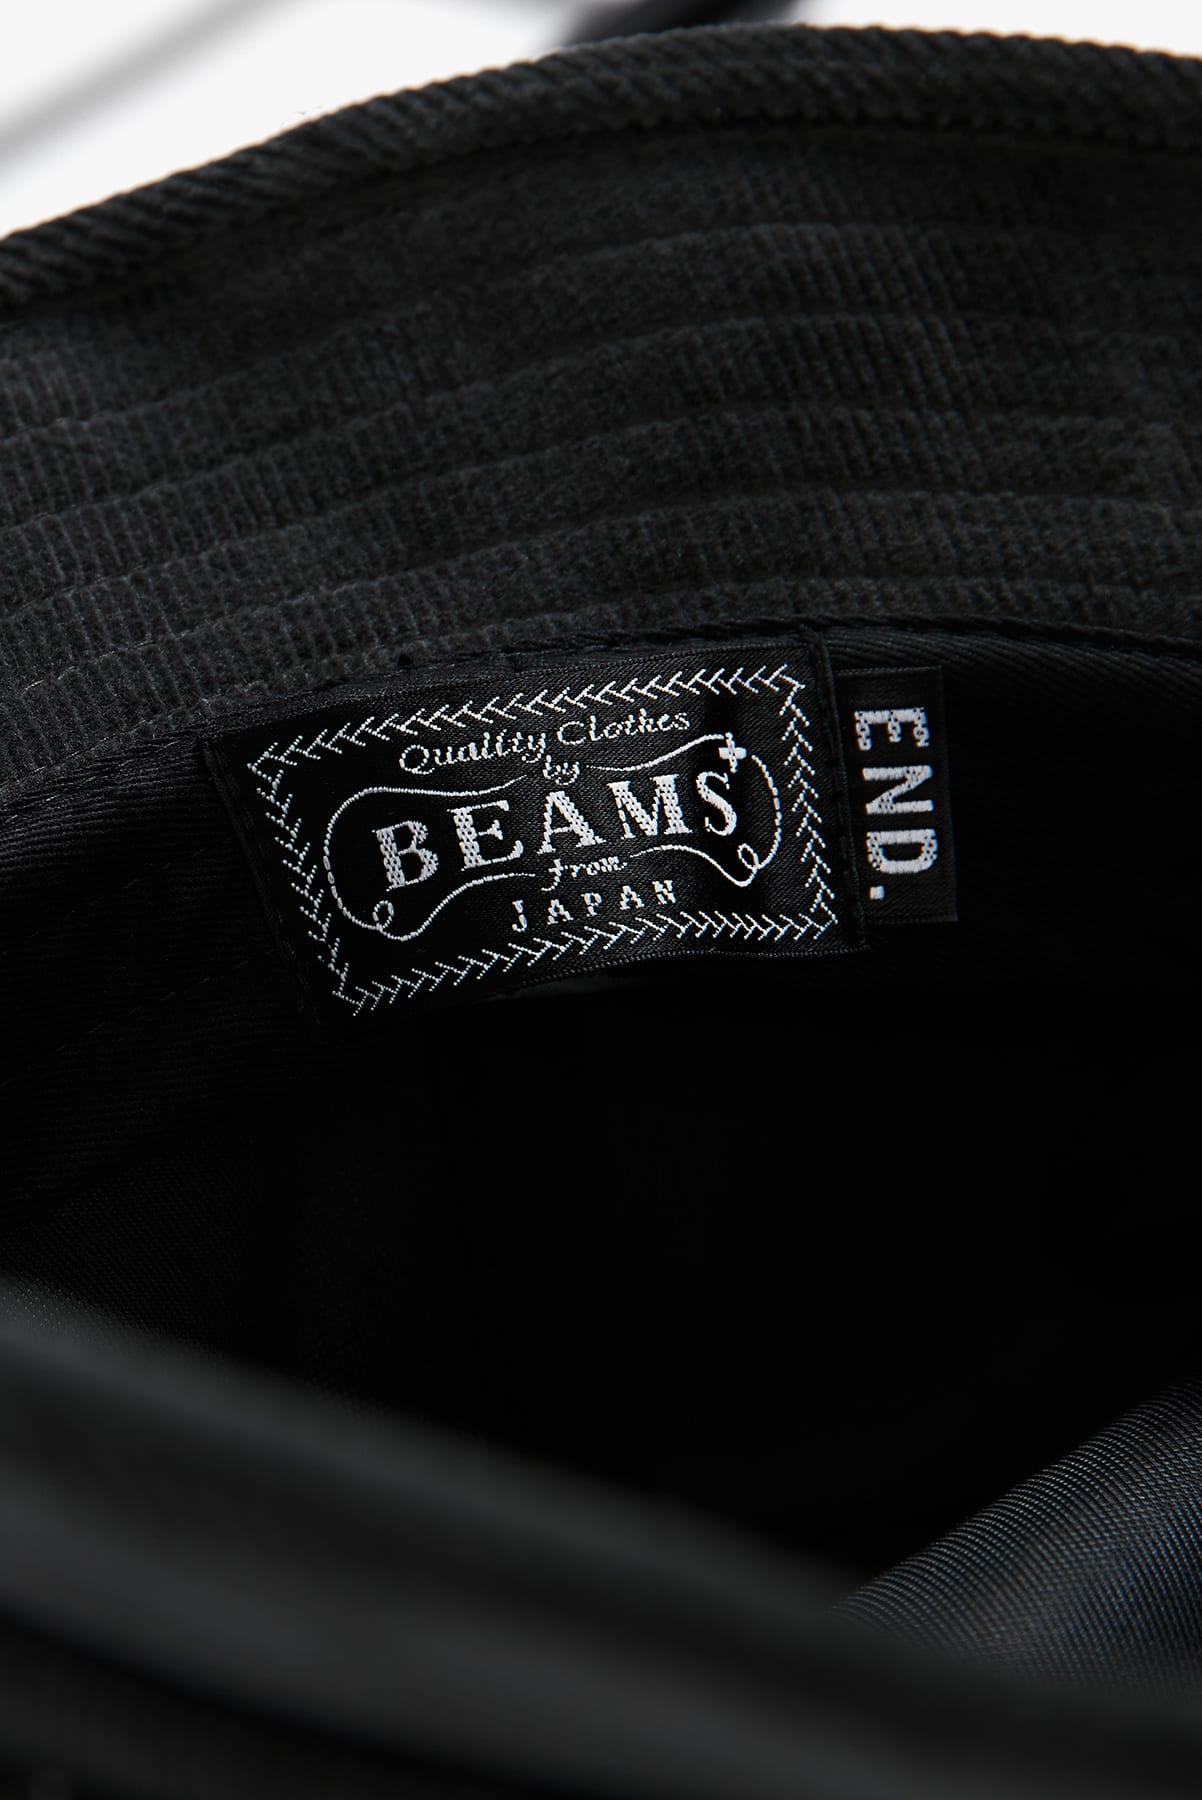 END. X BEAMS PLUS 15th Anniversary Capsule